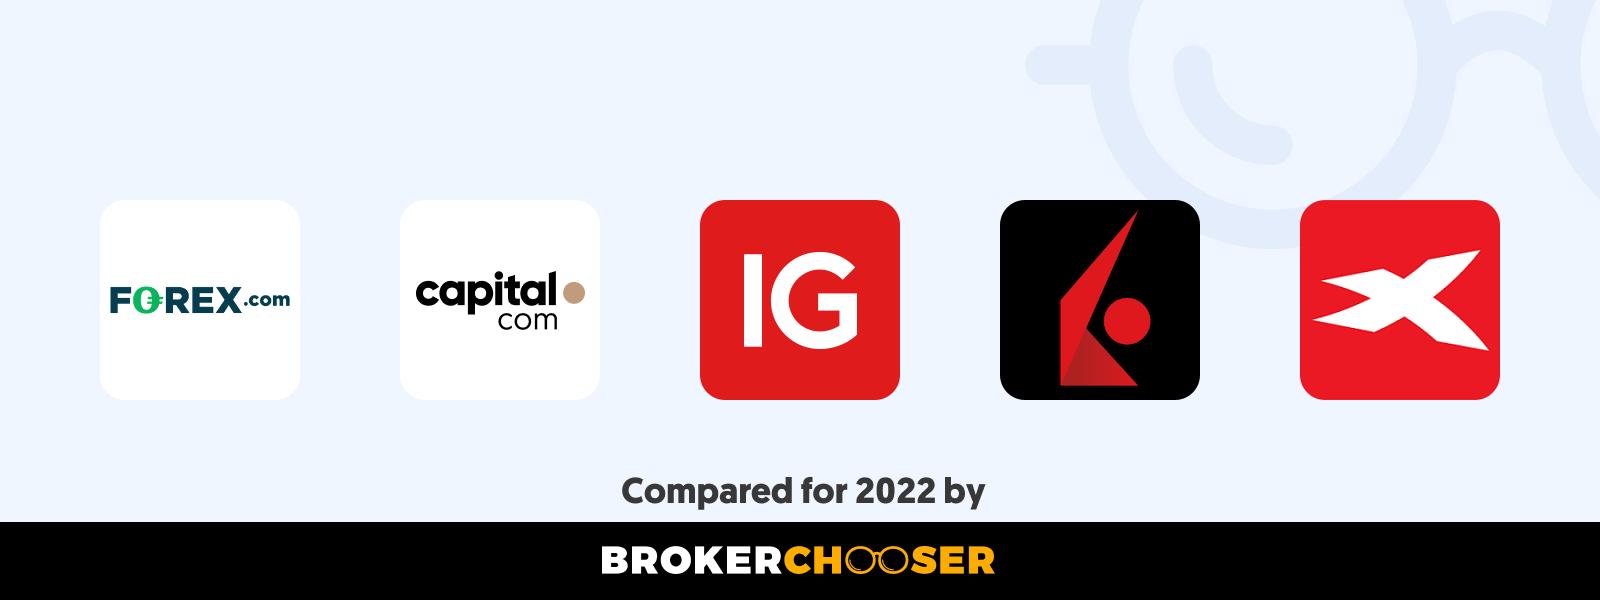 Best forex brokers for beginners in Cameroon in 2021